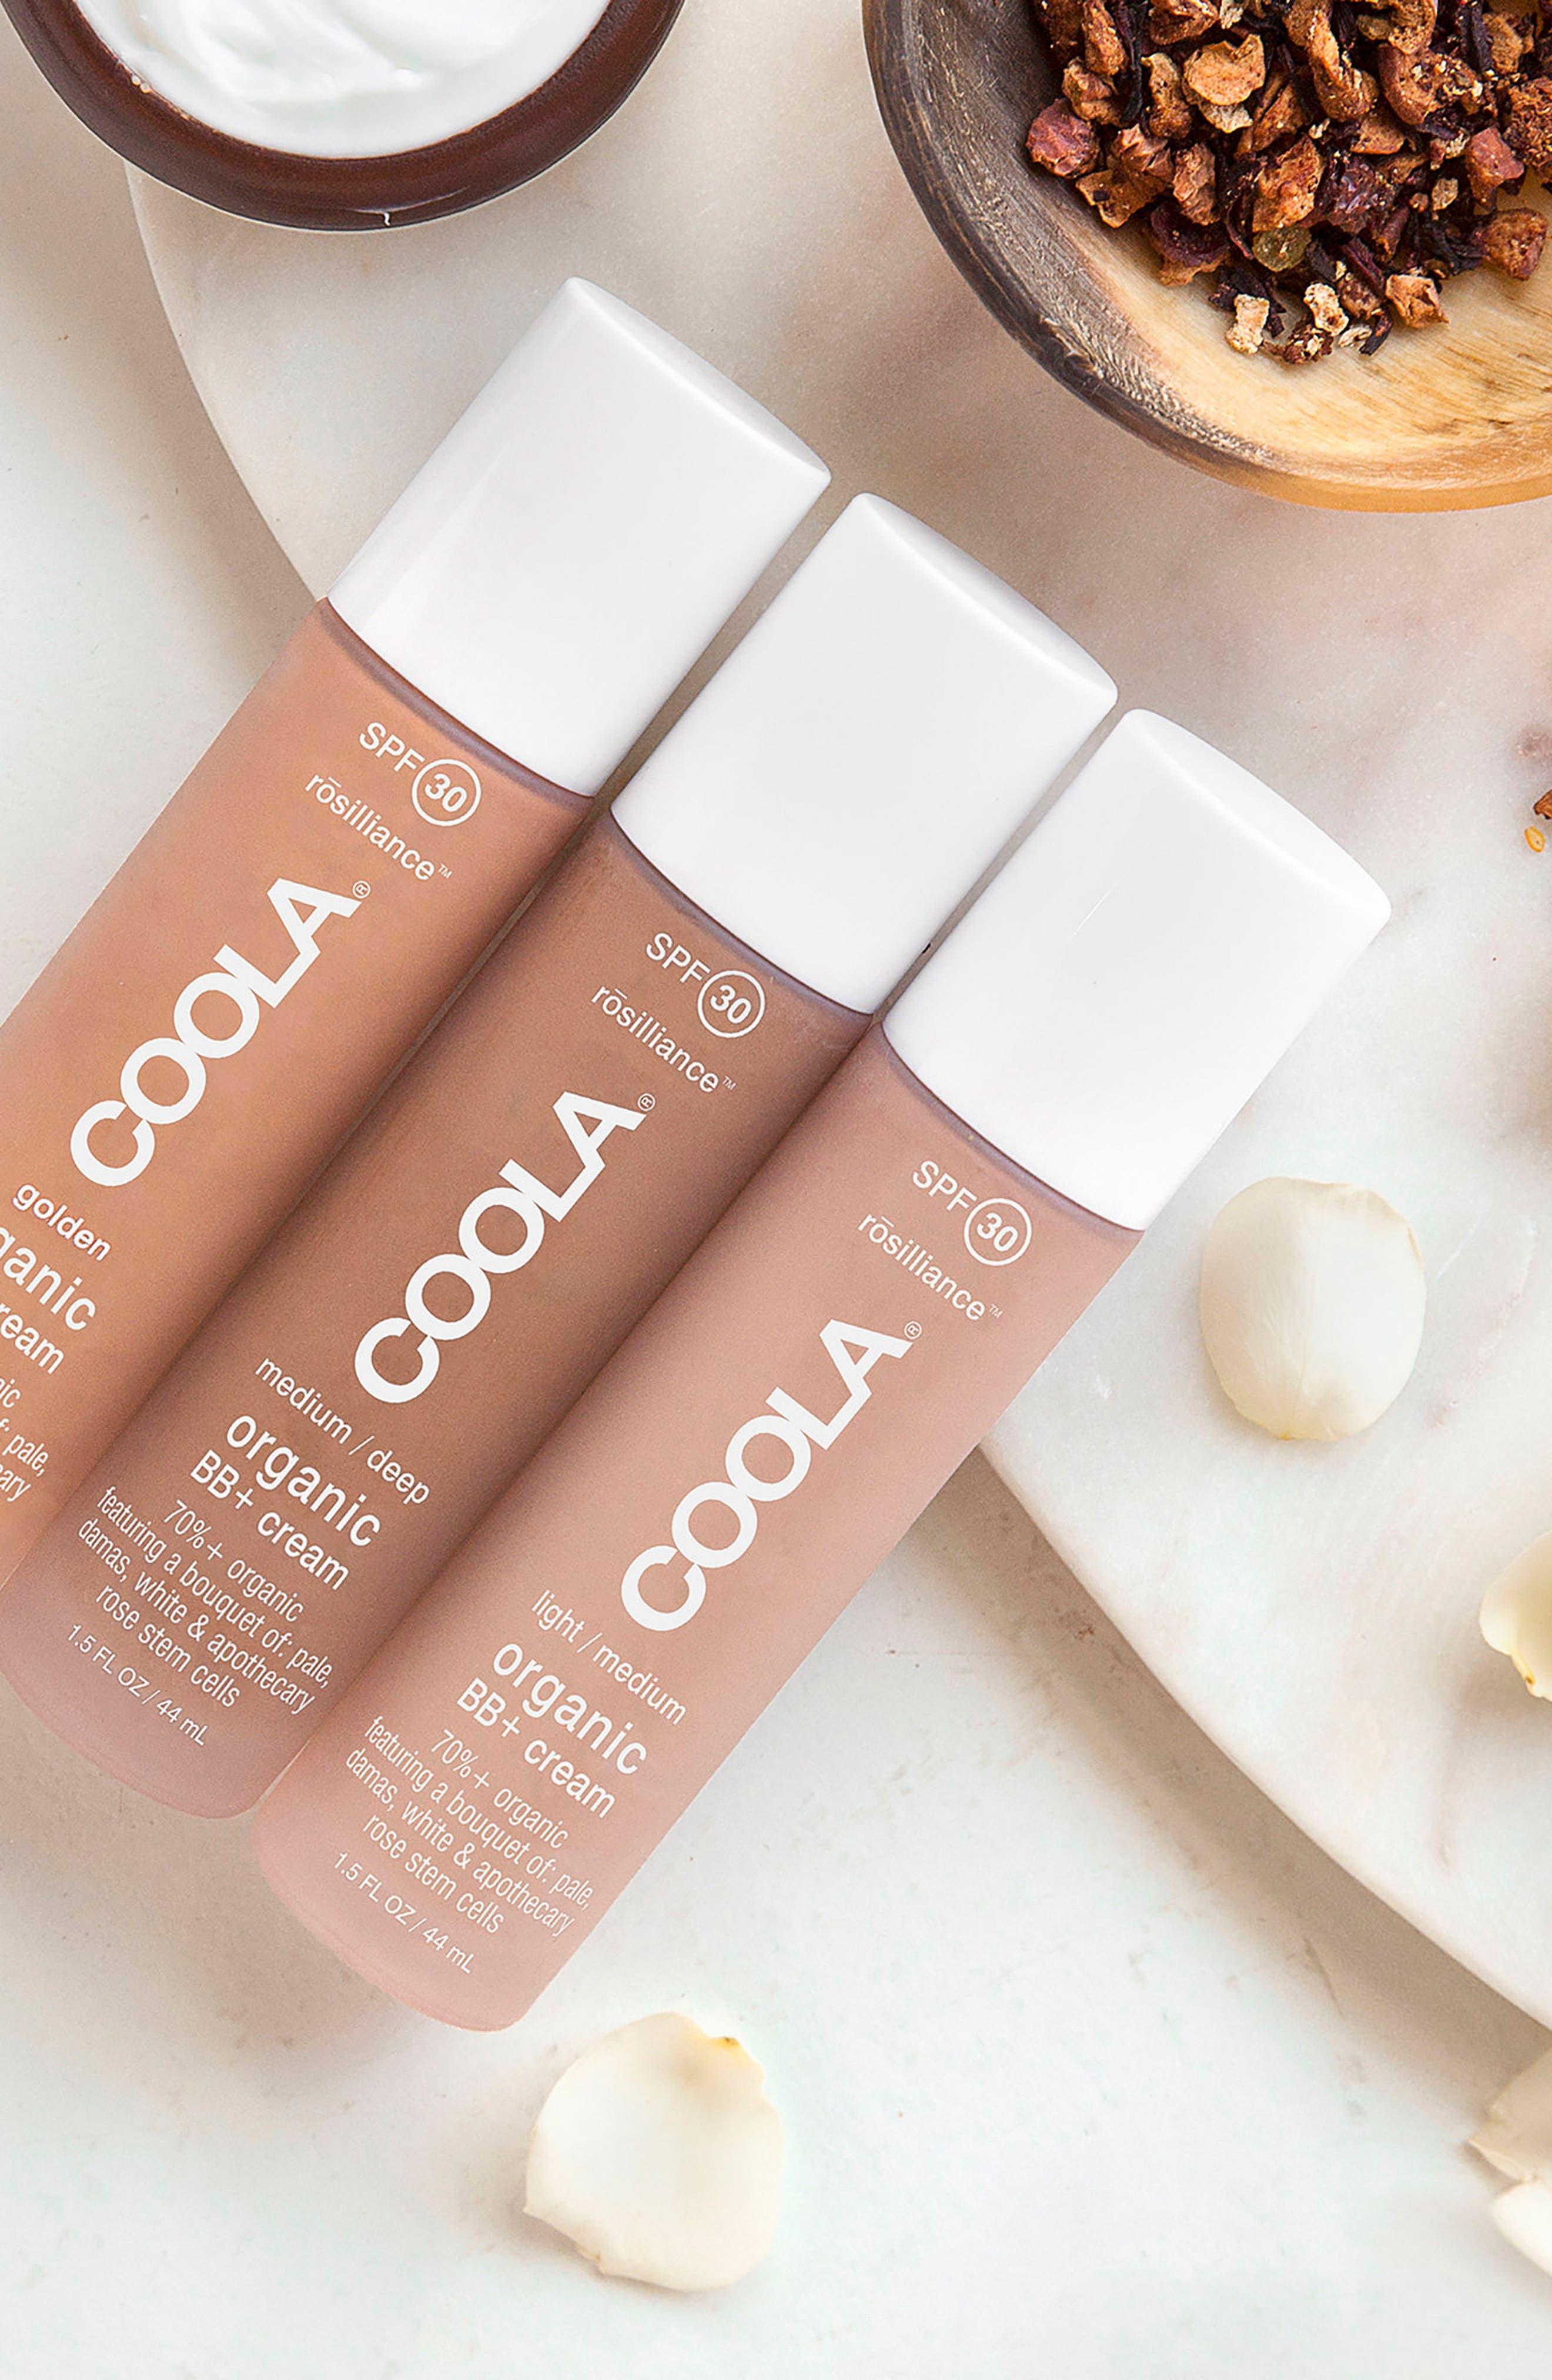 COOLA<sup>®</sup> Suncare rosilliance<sup>™</sup> Mineral BB+ Cream SPF 30,                             Alternate thumbnail 2, color,                             MEDIUM DARK